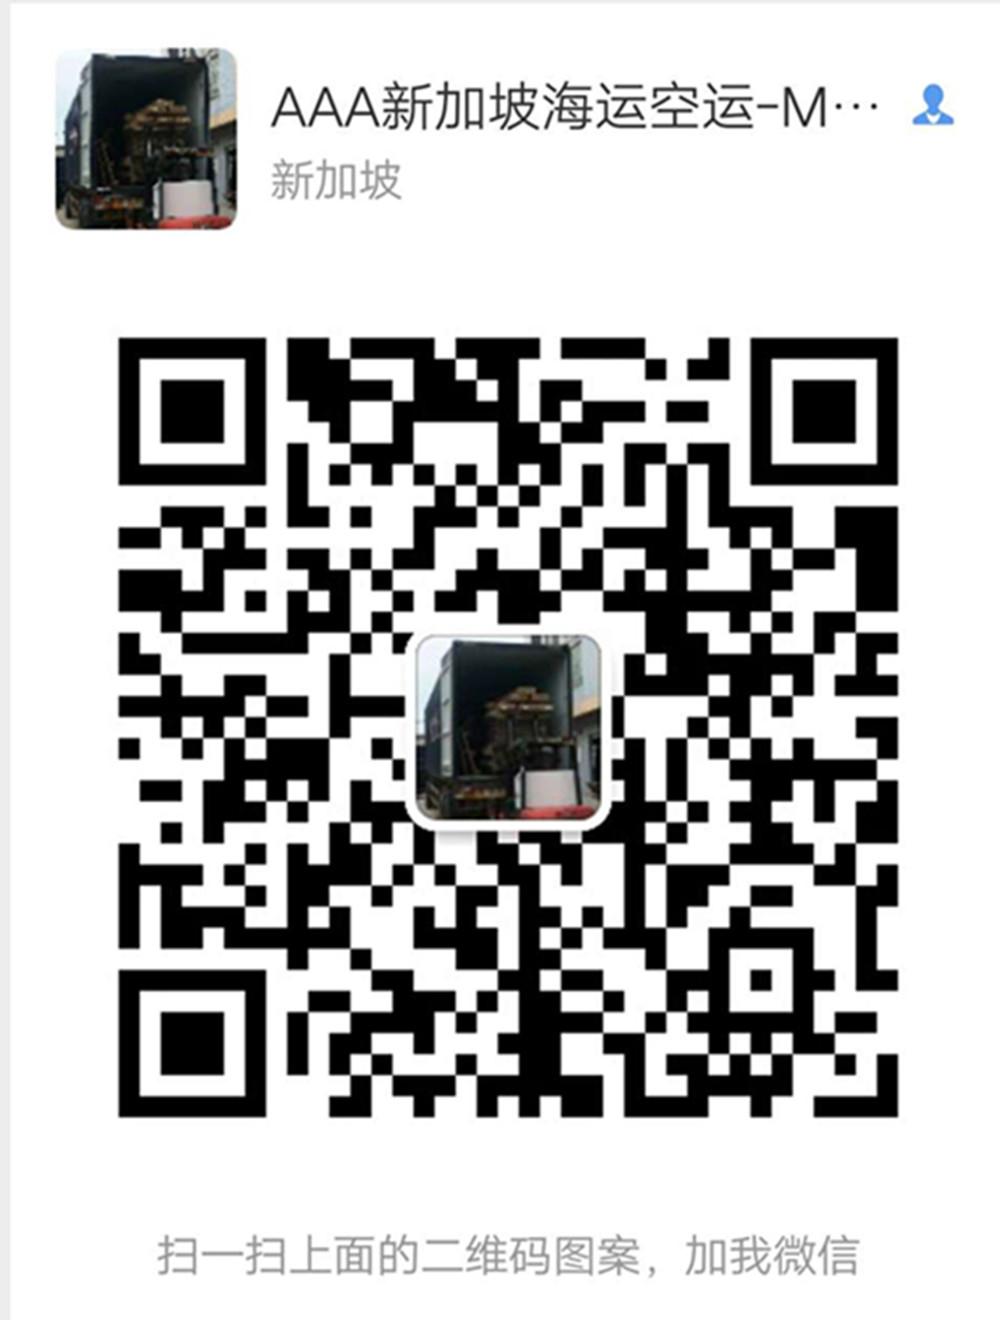 133c9138d54efed5a43a993a8573464_副本.jpg